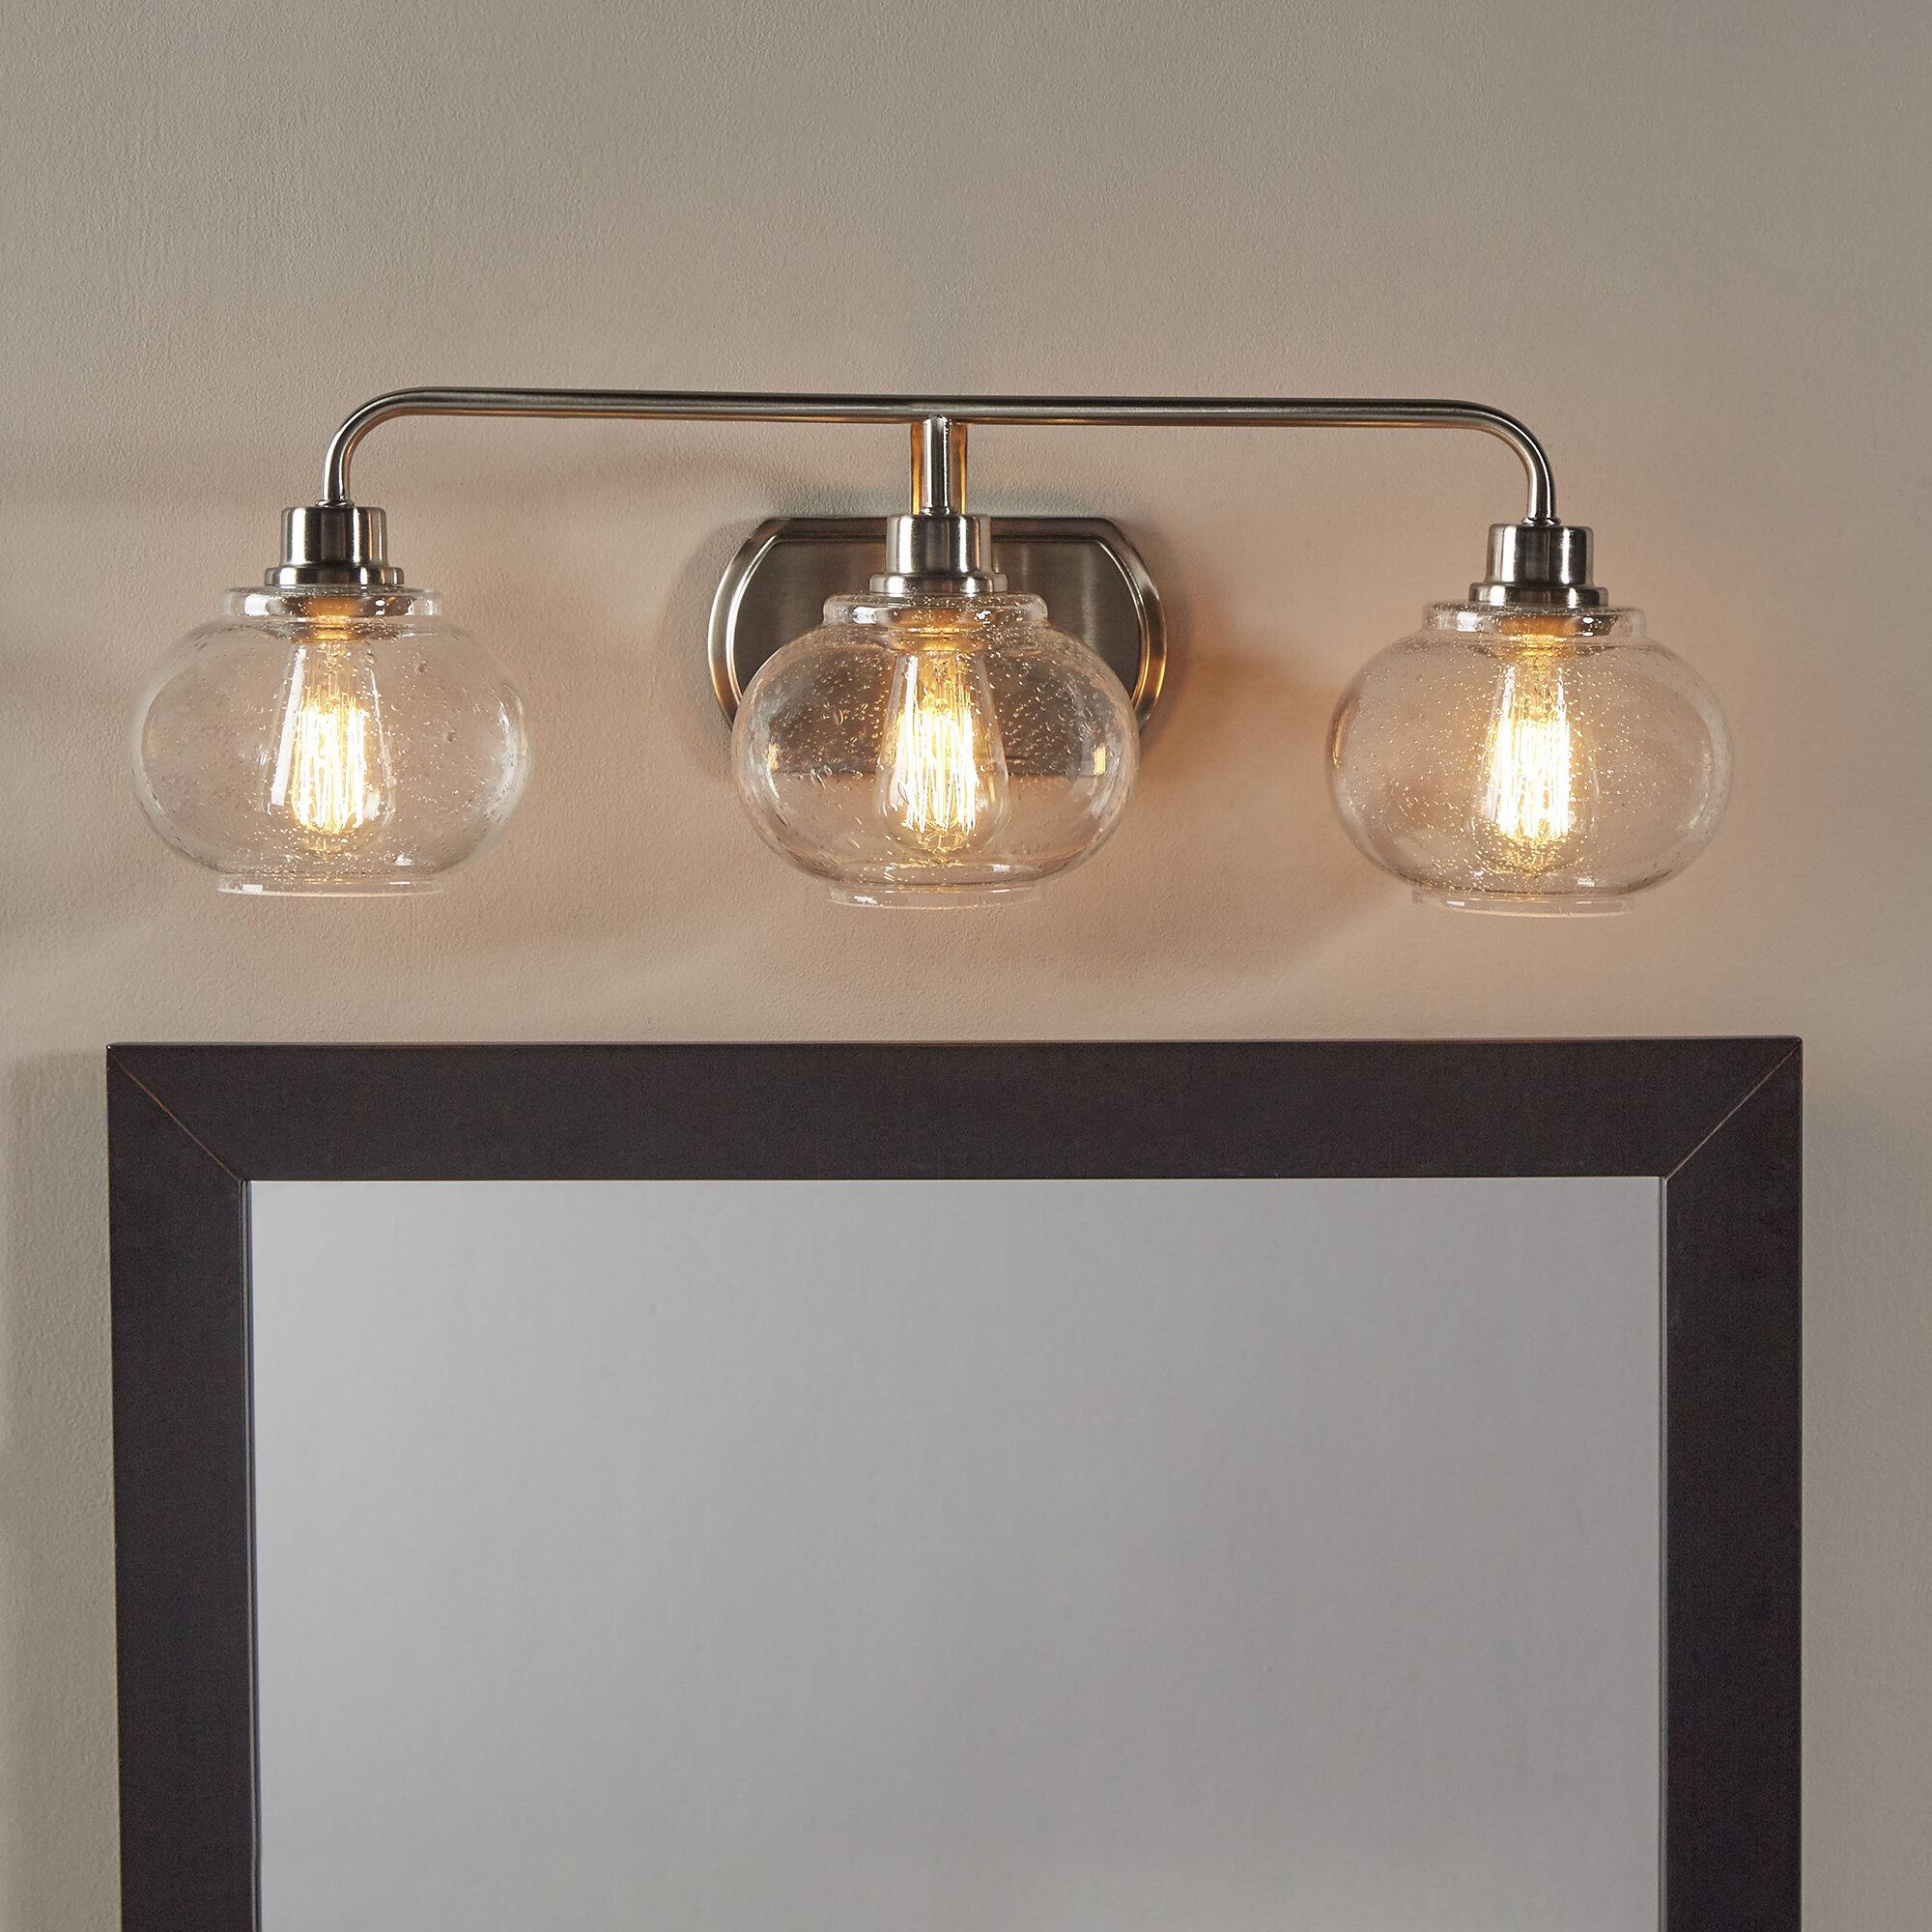 shade plus lamp vintage lamps vanity table dressing lights light